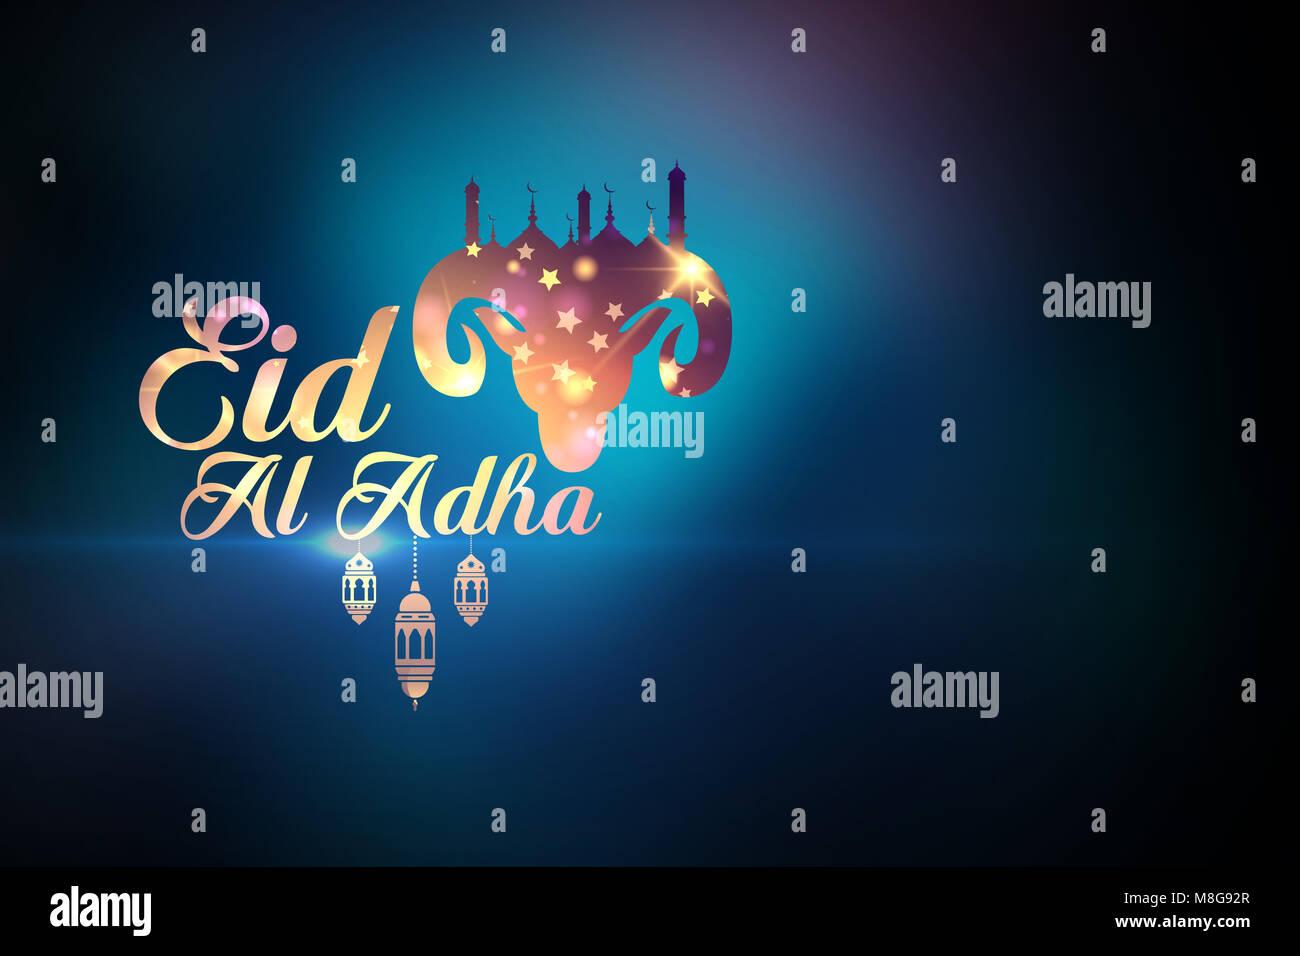 Eid al adha greetings stock photo 177379295 alamy eid al adha greetings kristyandbryce Choice Image